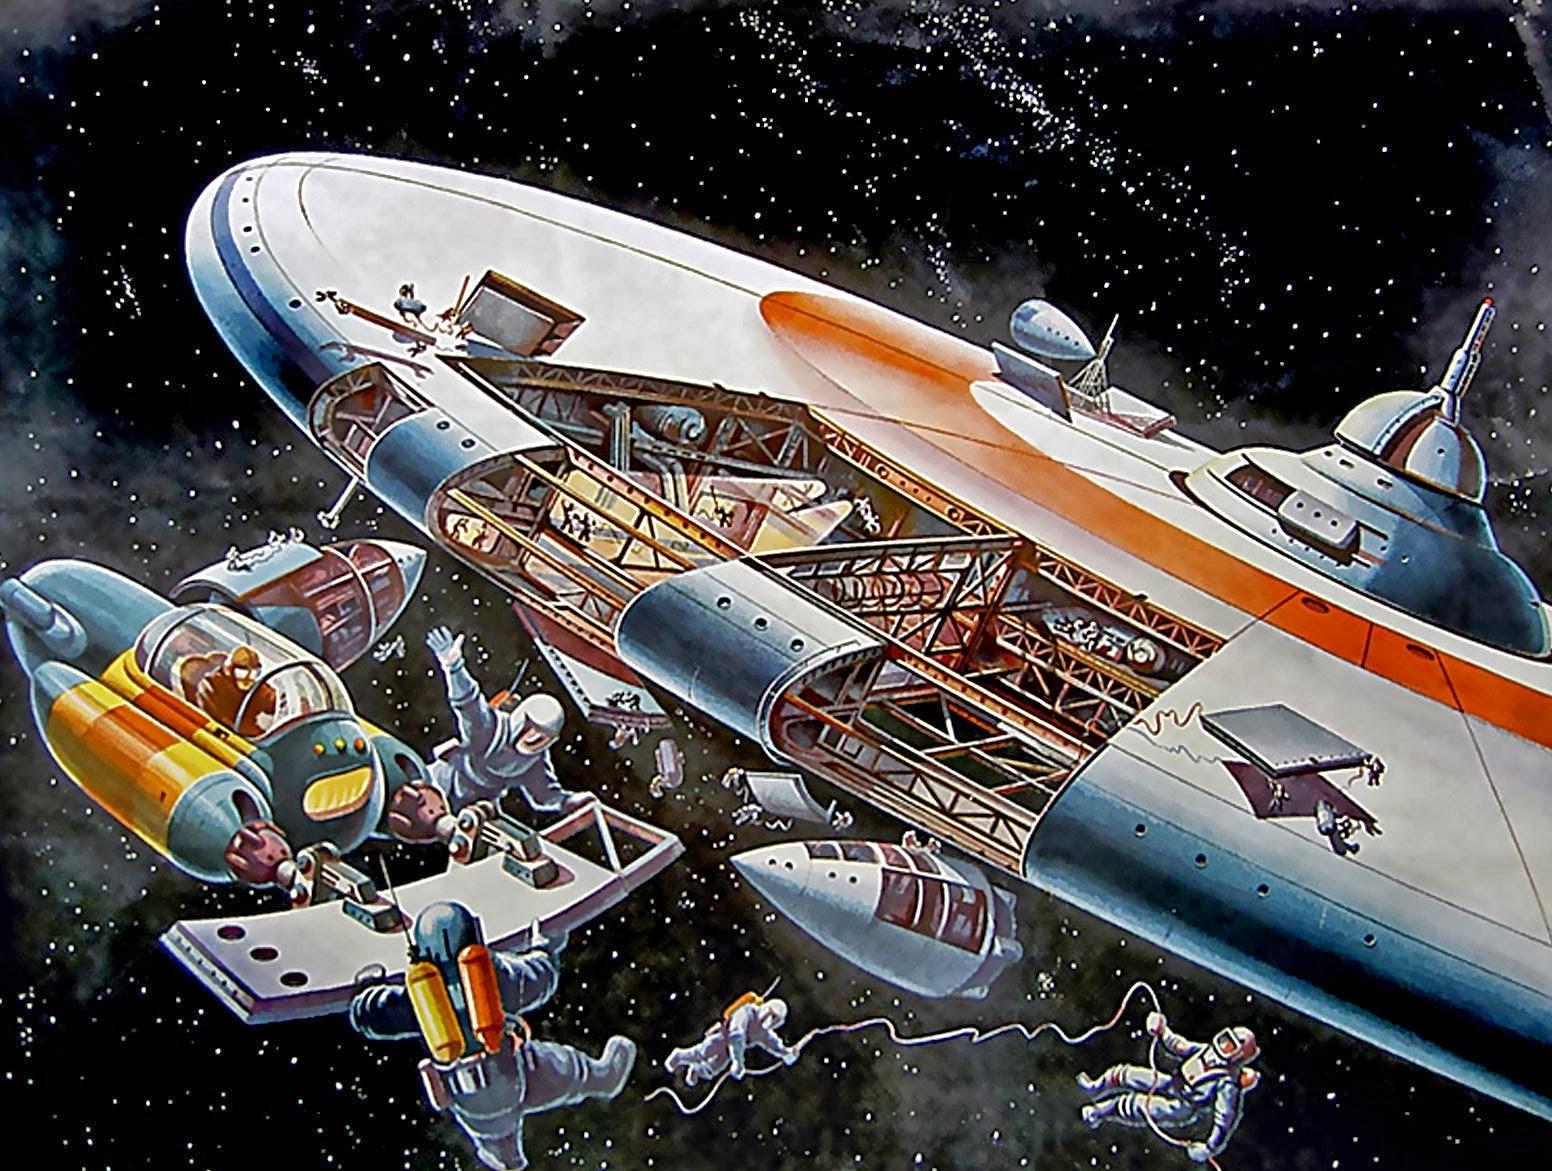 futurism space age